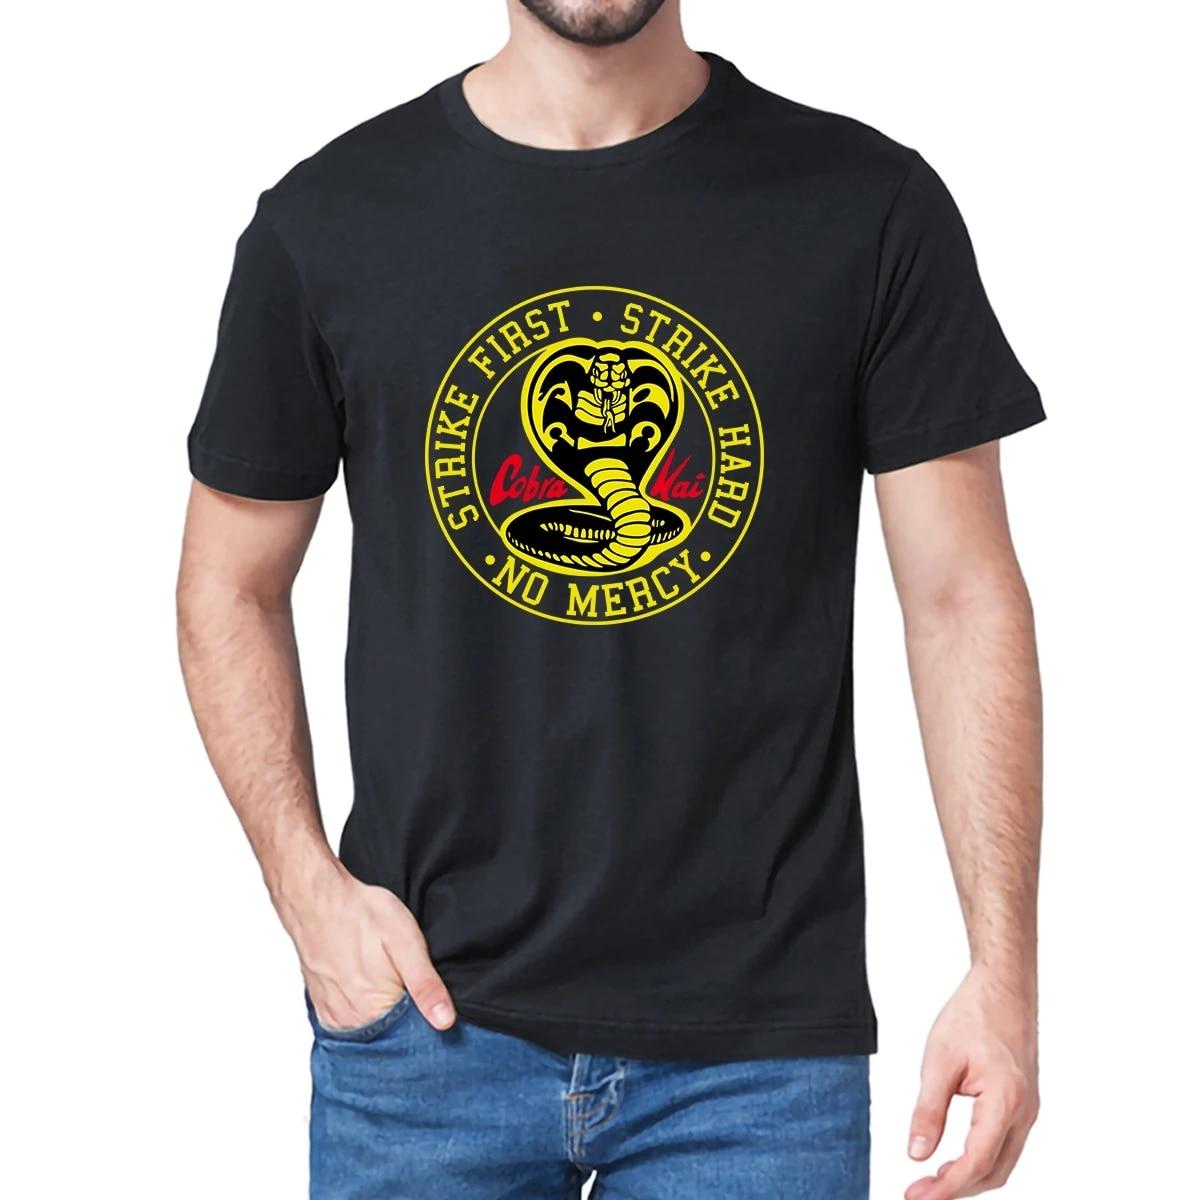 Unisex 100% Cotton Cobra Kai No Mercy Strike First Strike Hard 80s Karate Kid Movie Men's T-Shirt Gift women top soft tee